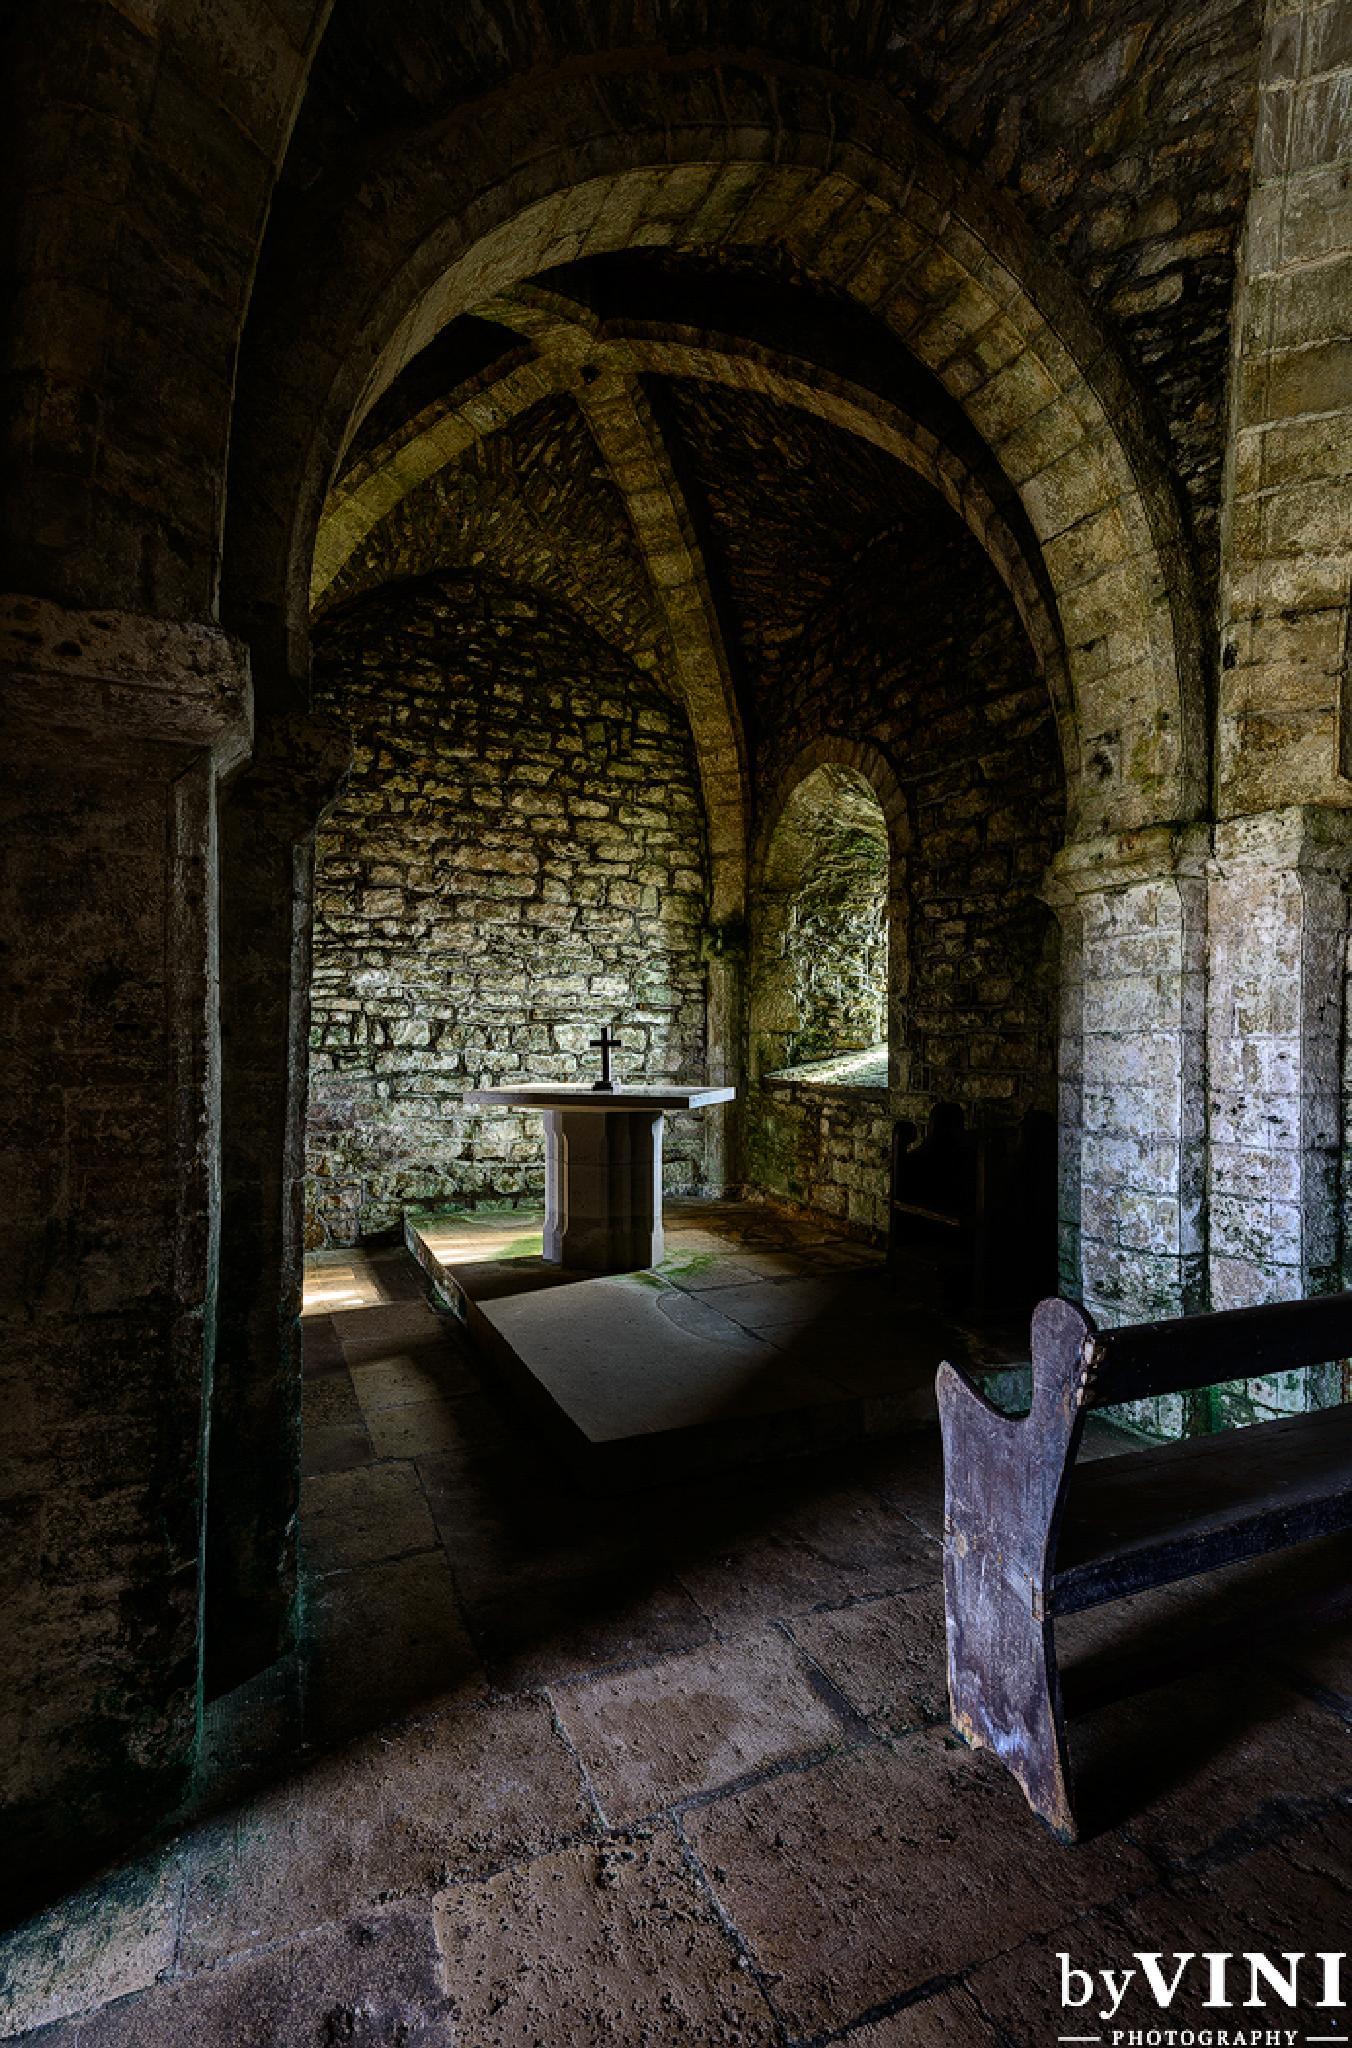 St. Aldhelm's Chapel by byVini